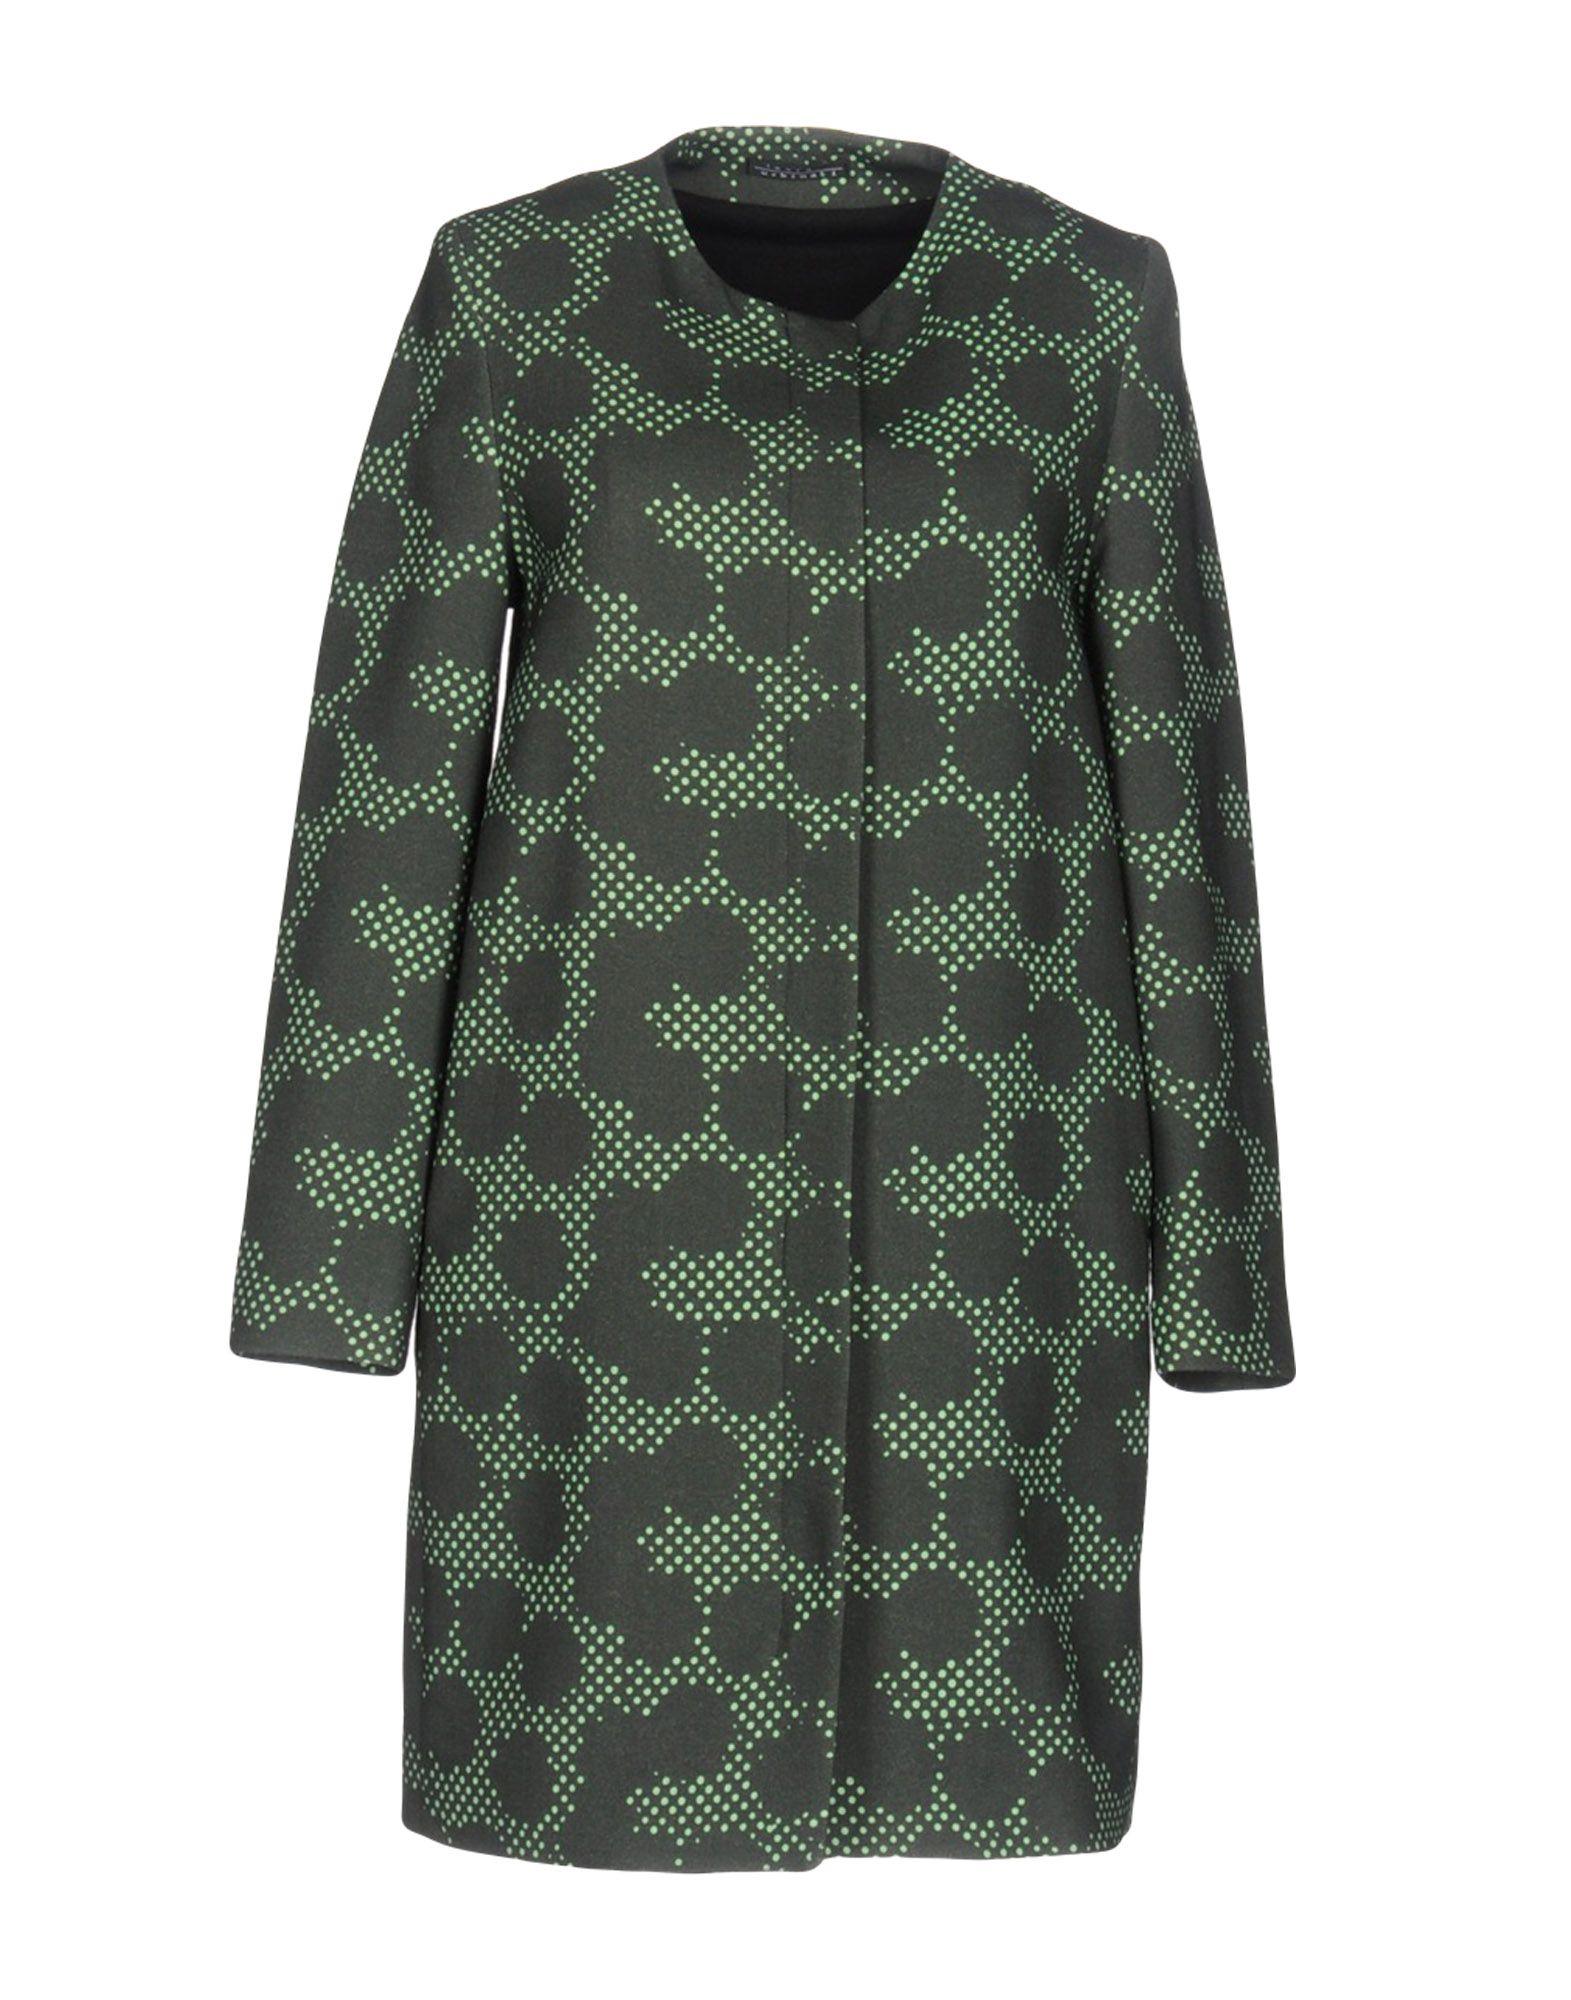 LAURA URBINATI Coat in Green